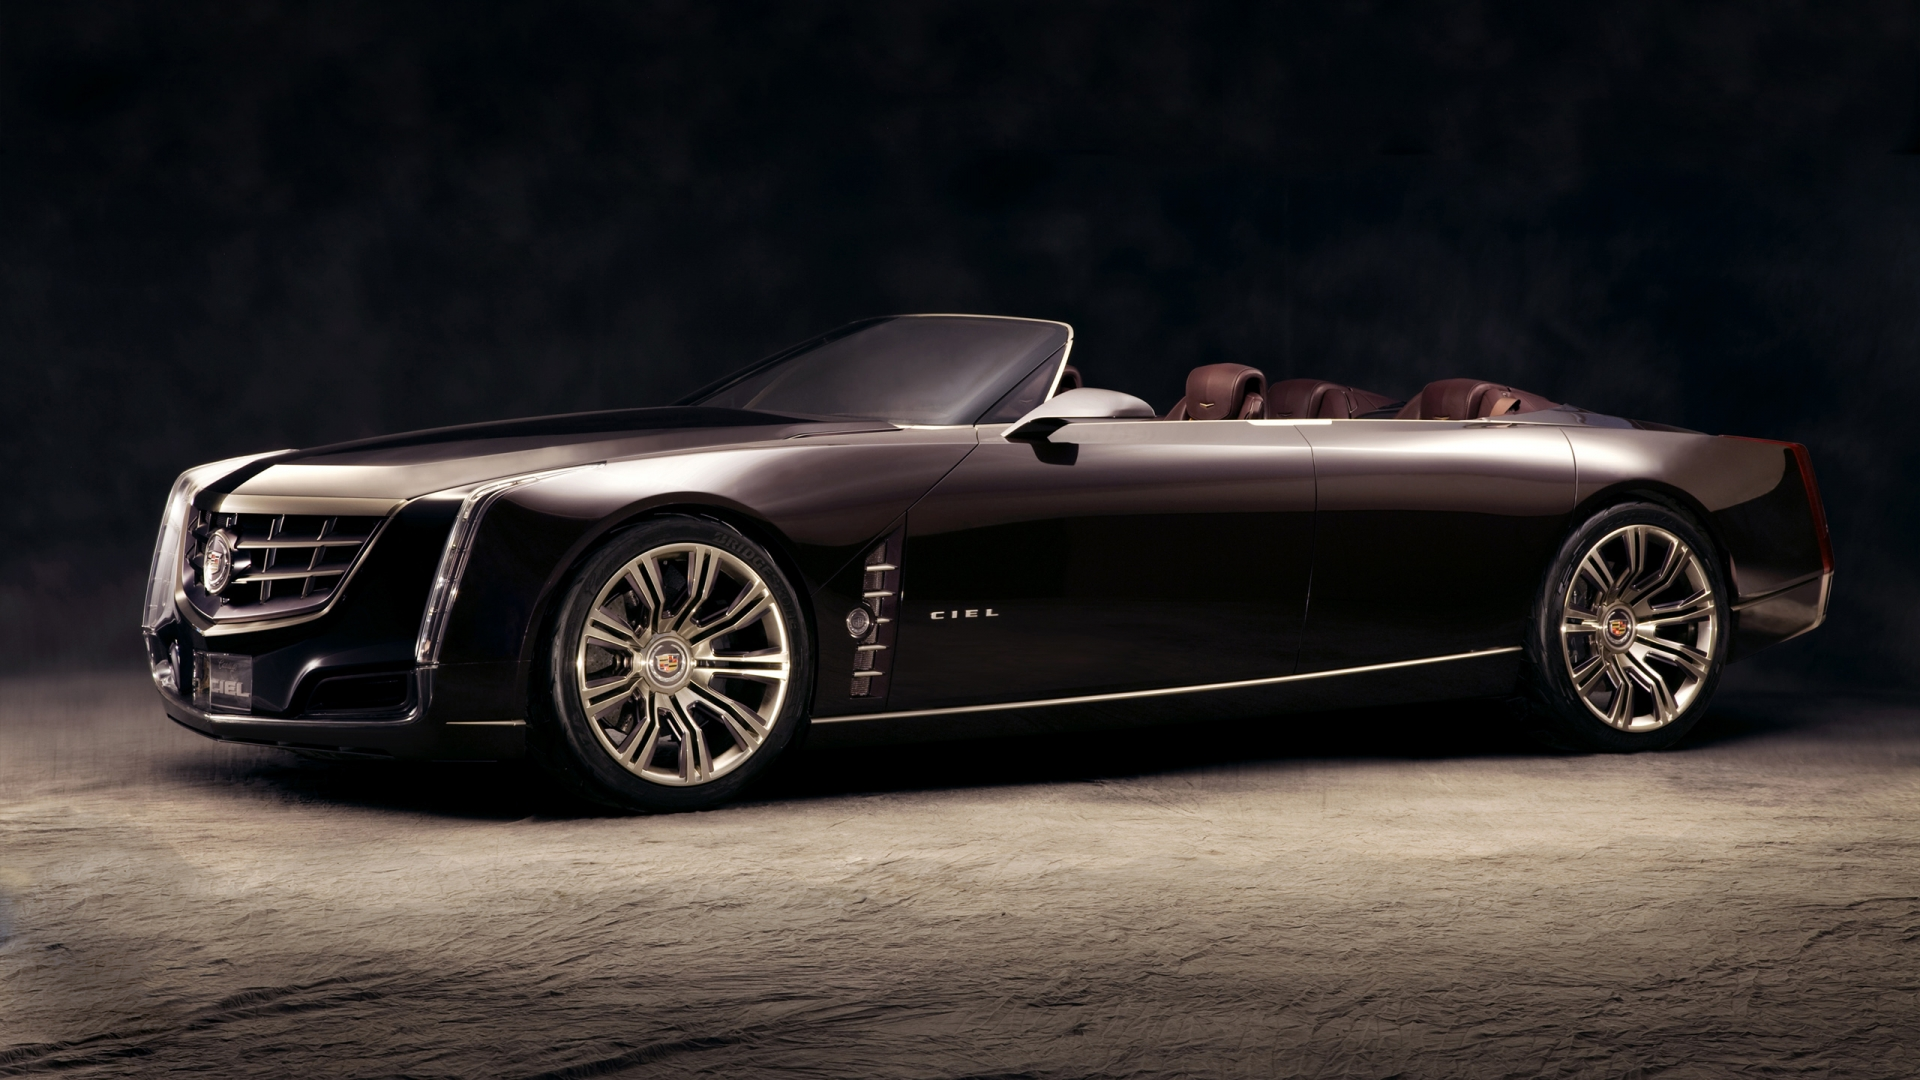 Classic Cadillac 27274